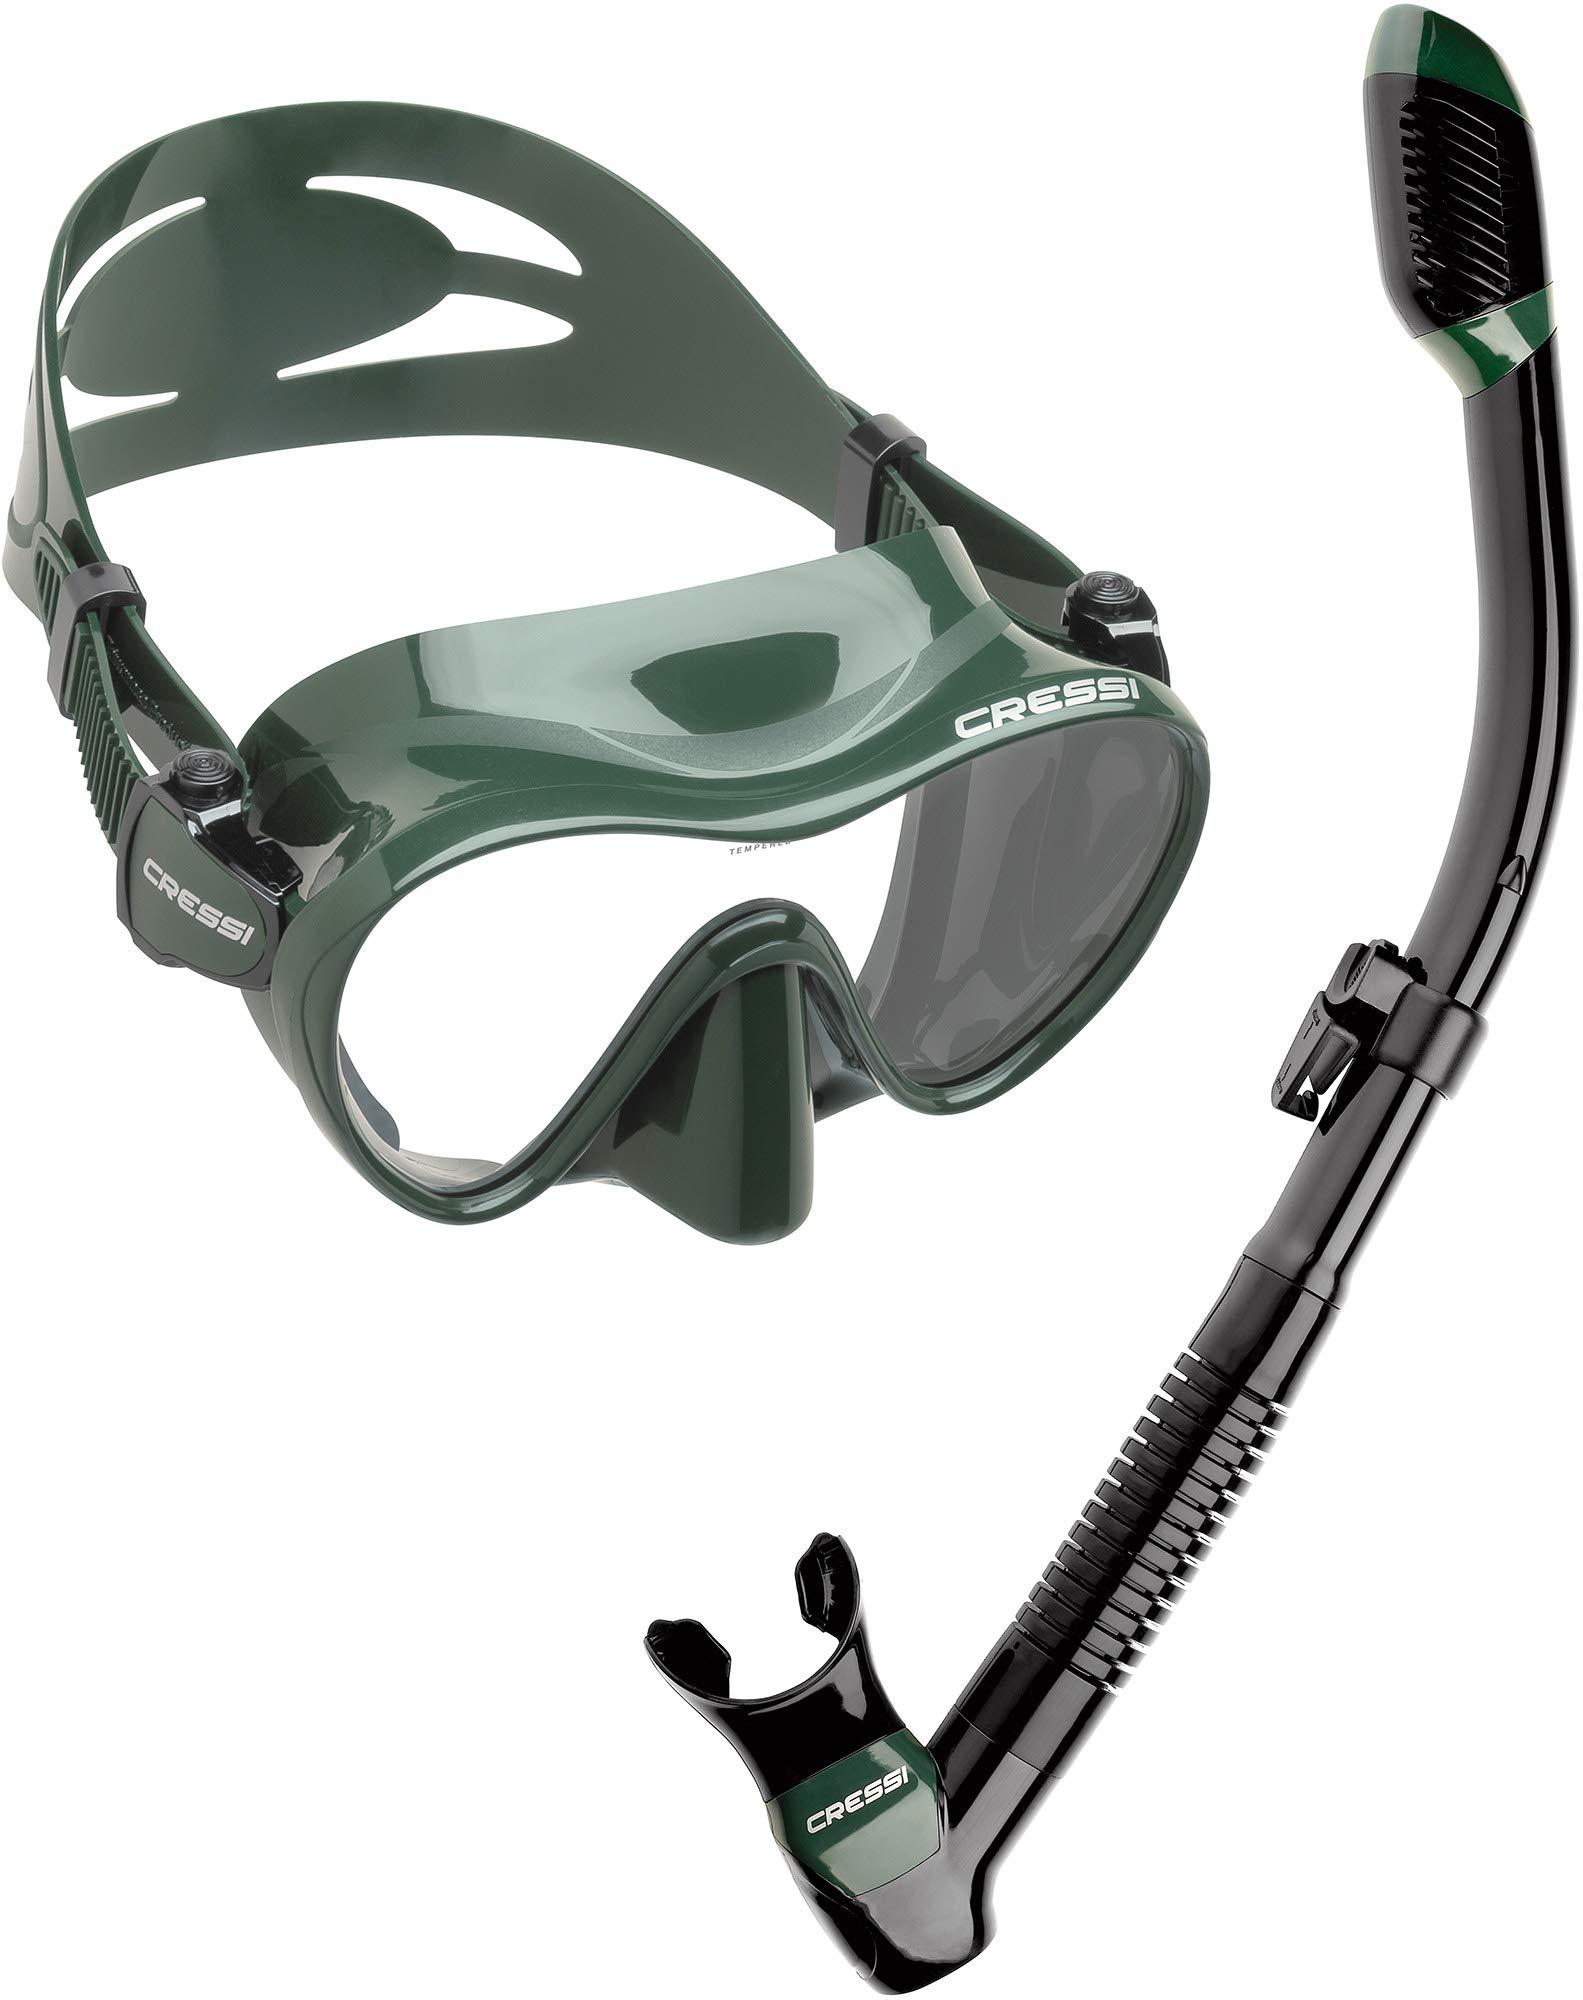 Cressi Scuba Diving Snorkeling Freediving Mask Snorkel Set, Green Camo by Cressi